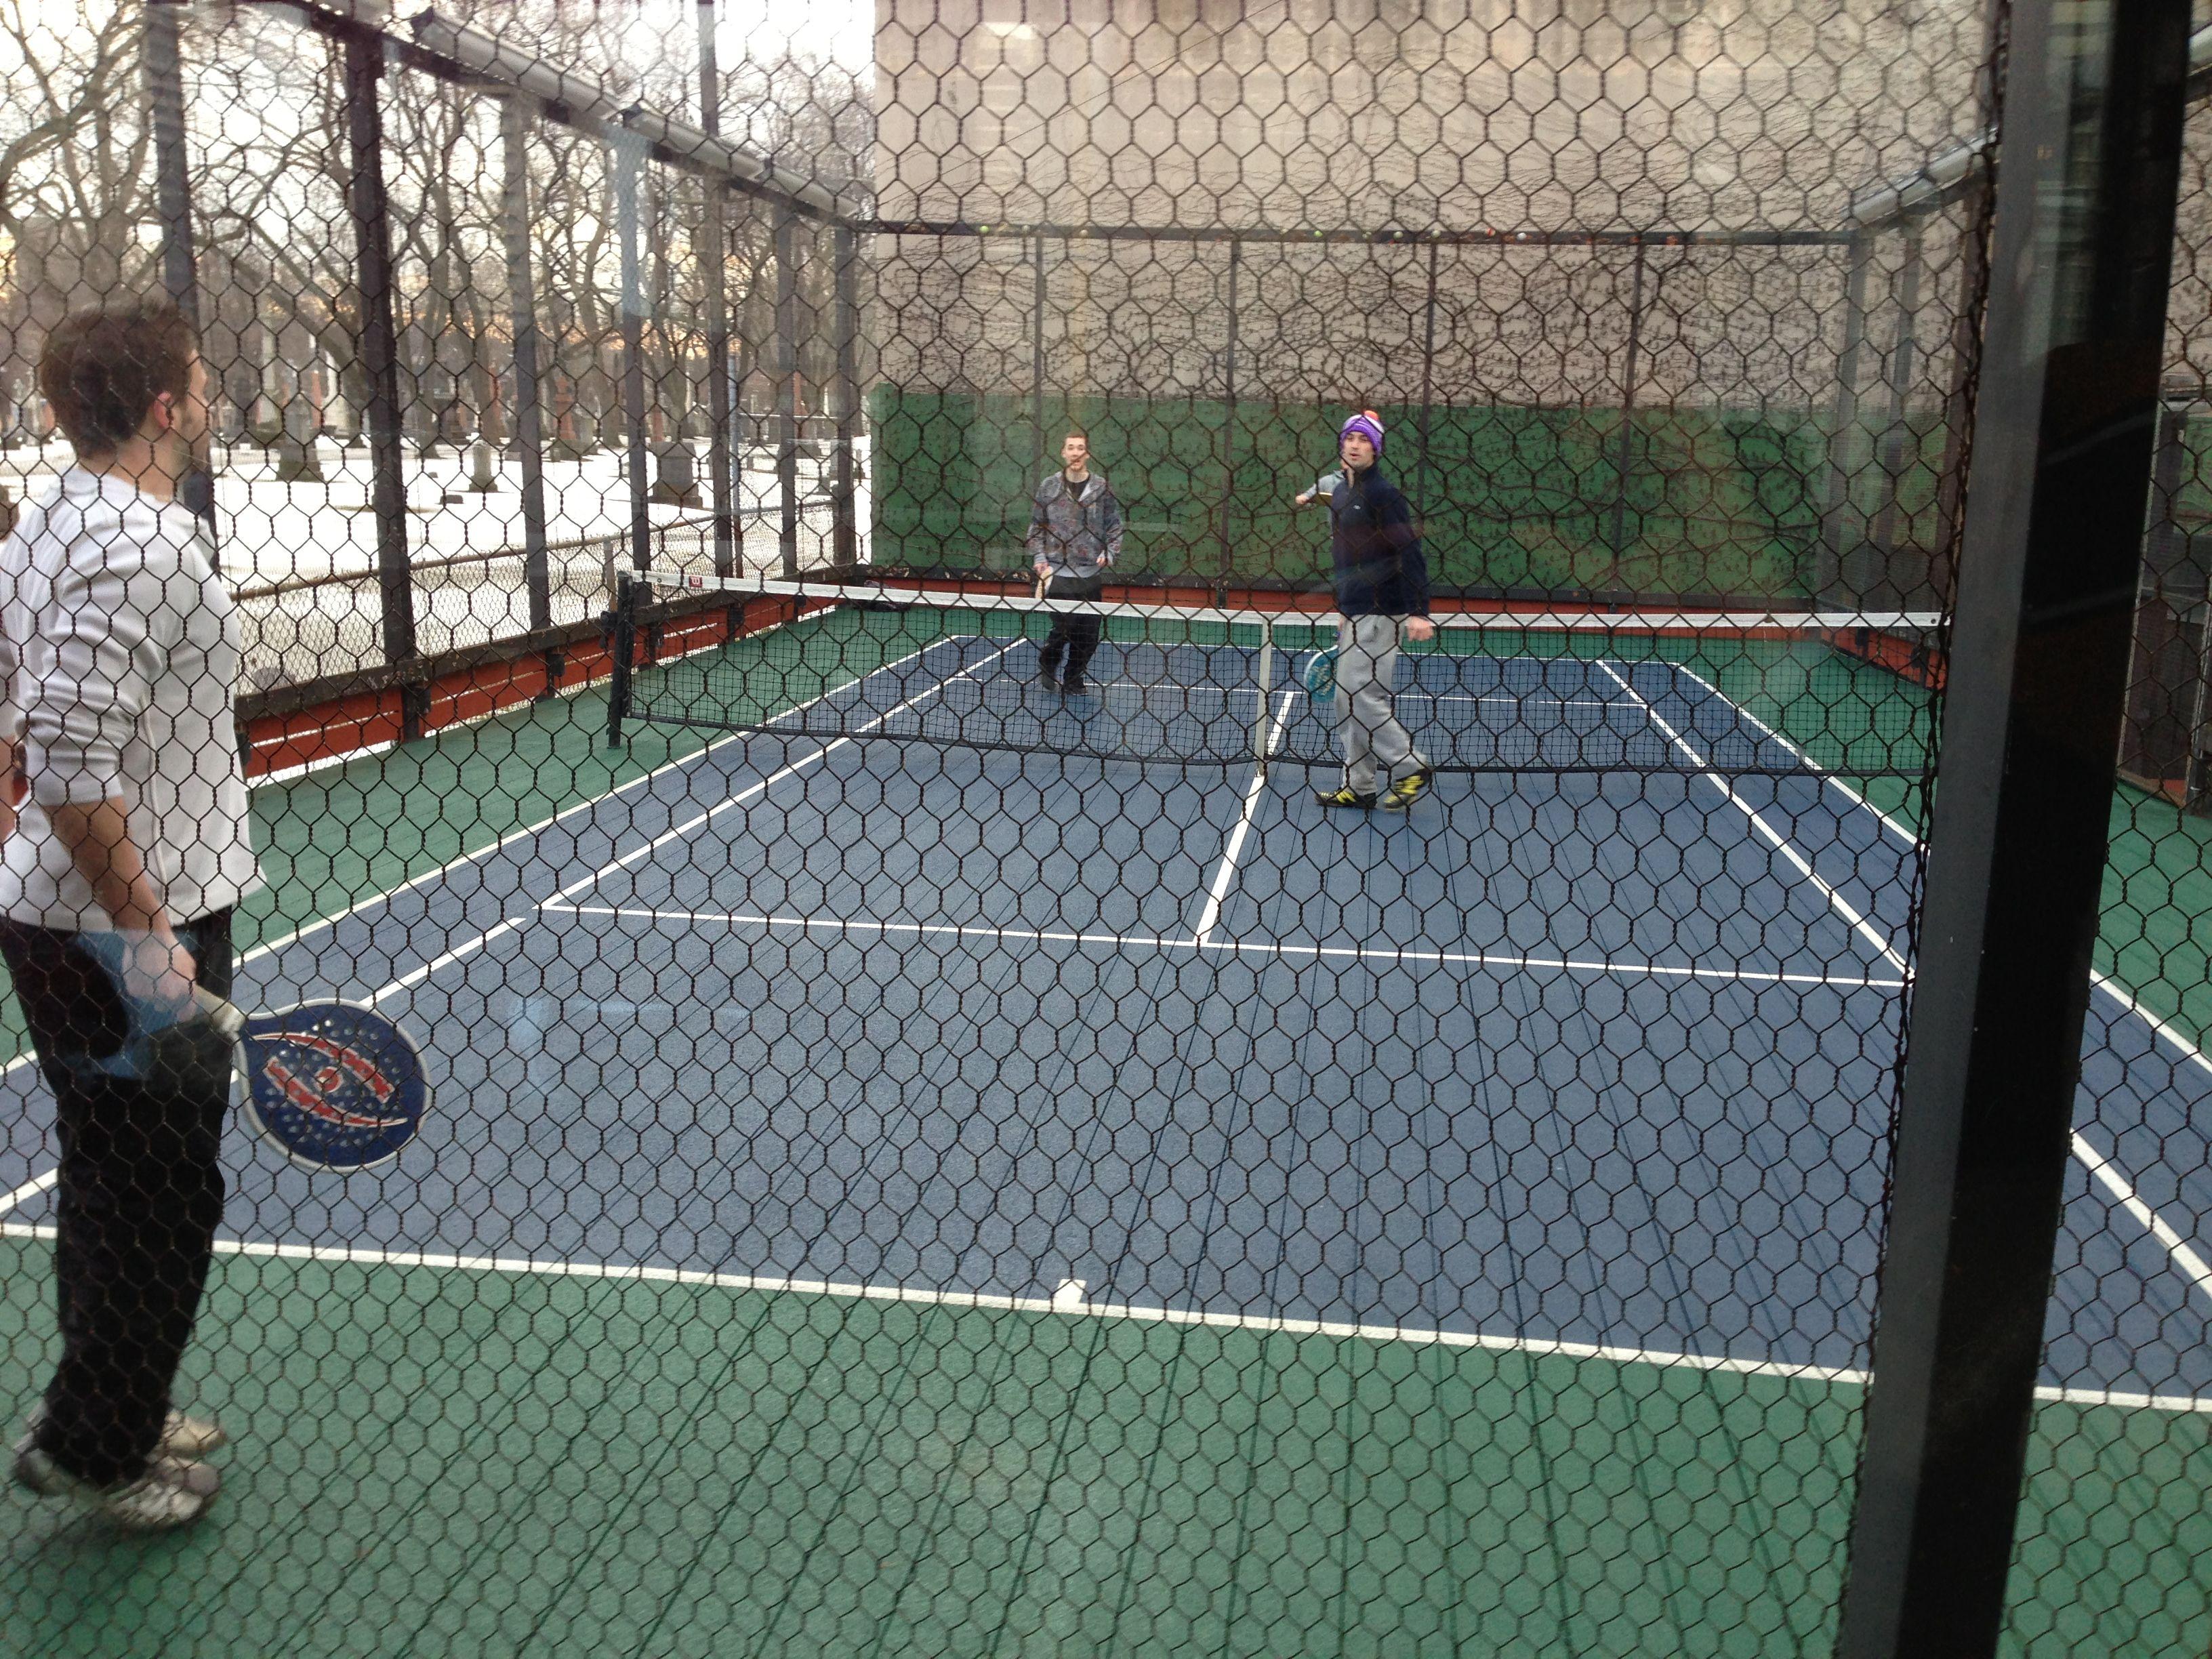 Every season is Paddle Tennis season #bnr #newfoundsport